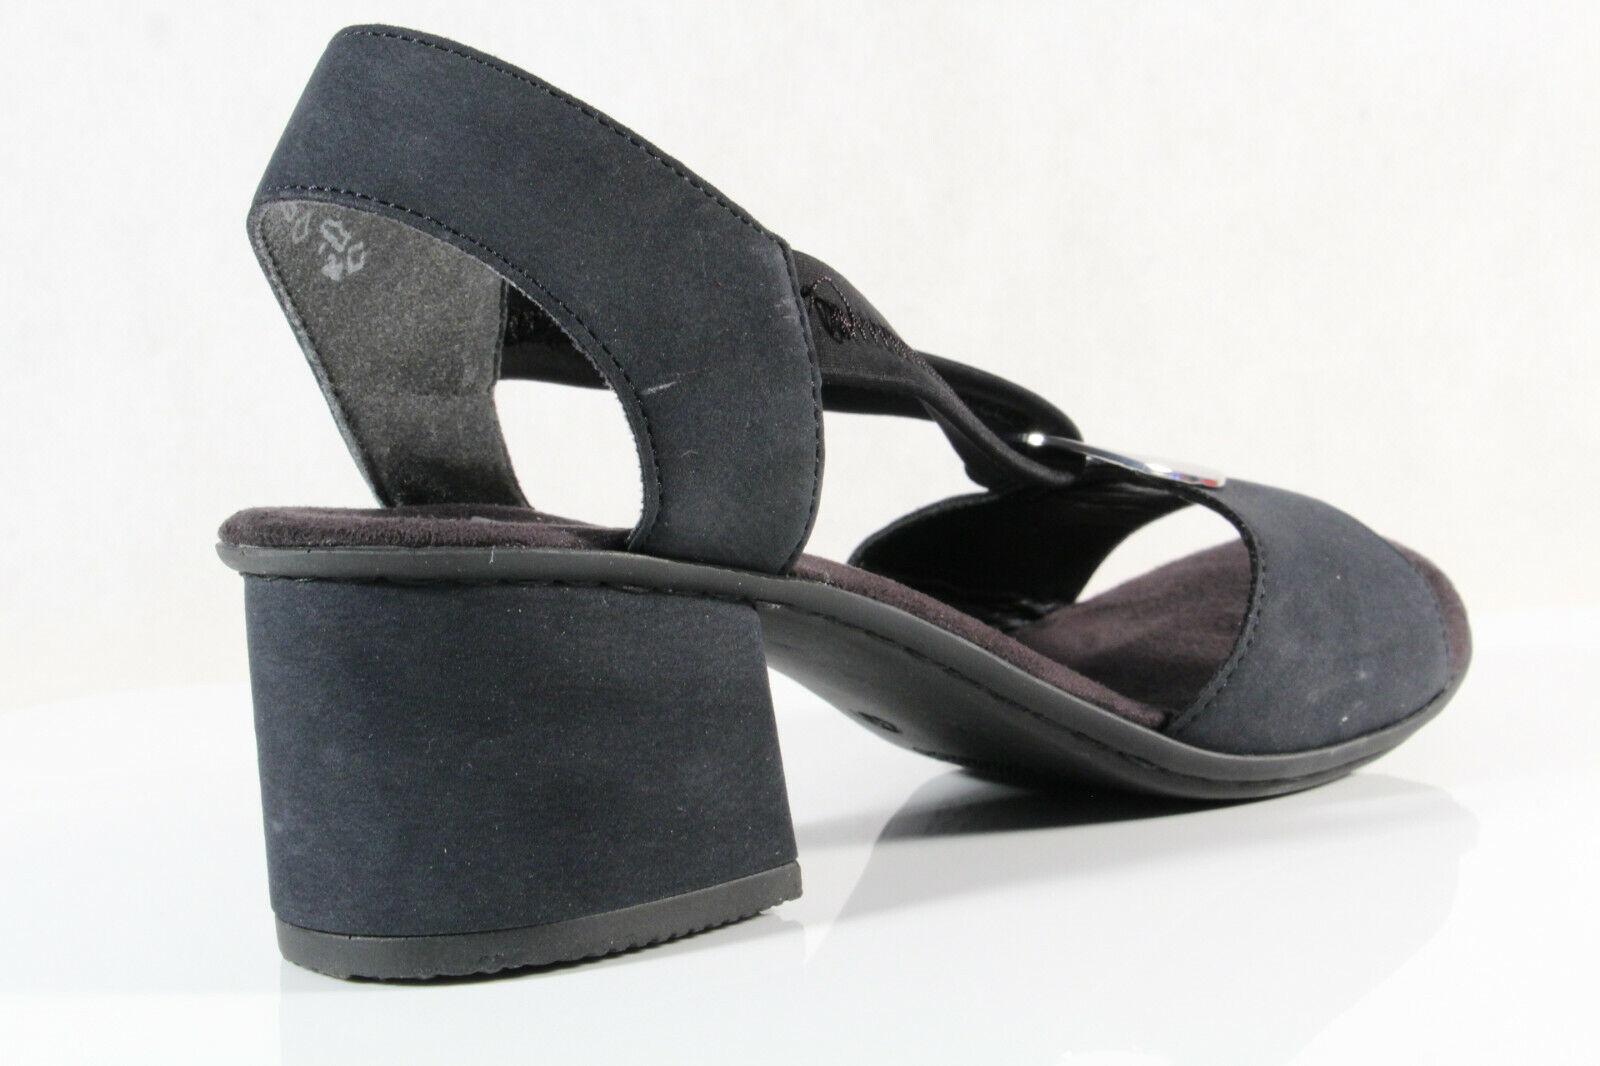 Rieker Damen Sandale Sandalette blau 63453 NEU!! Kaufen KrSIo